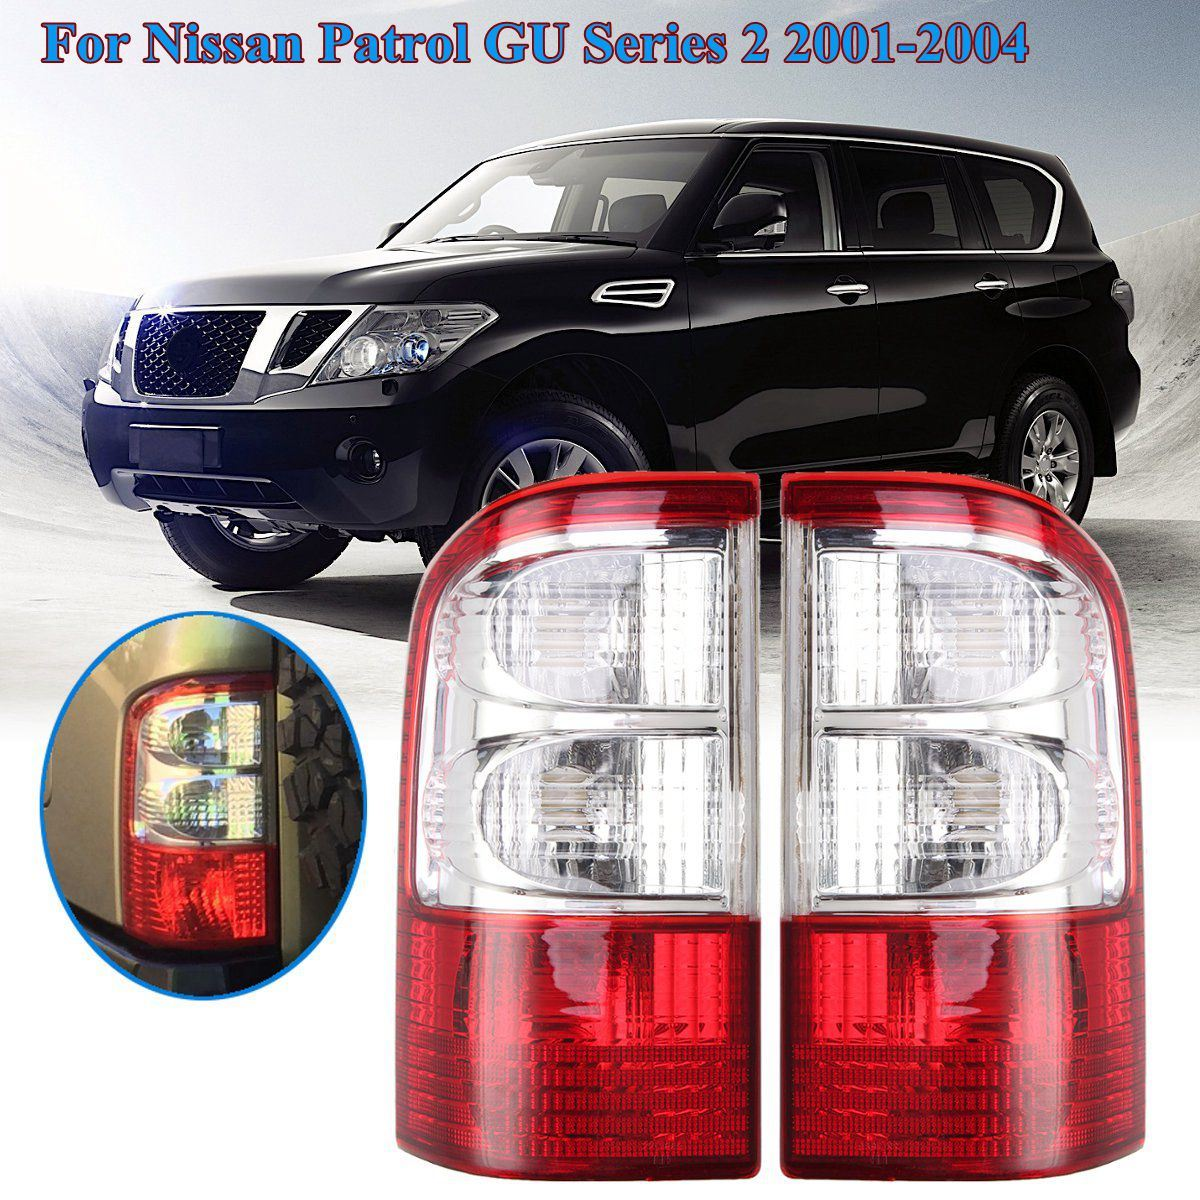 China 12 V Rear Tail Light for Nissan Patrol Gu Series 2 ... on